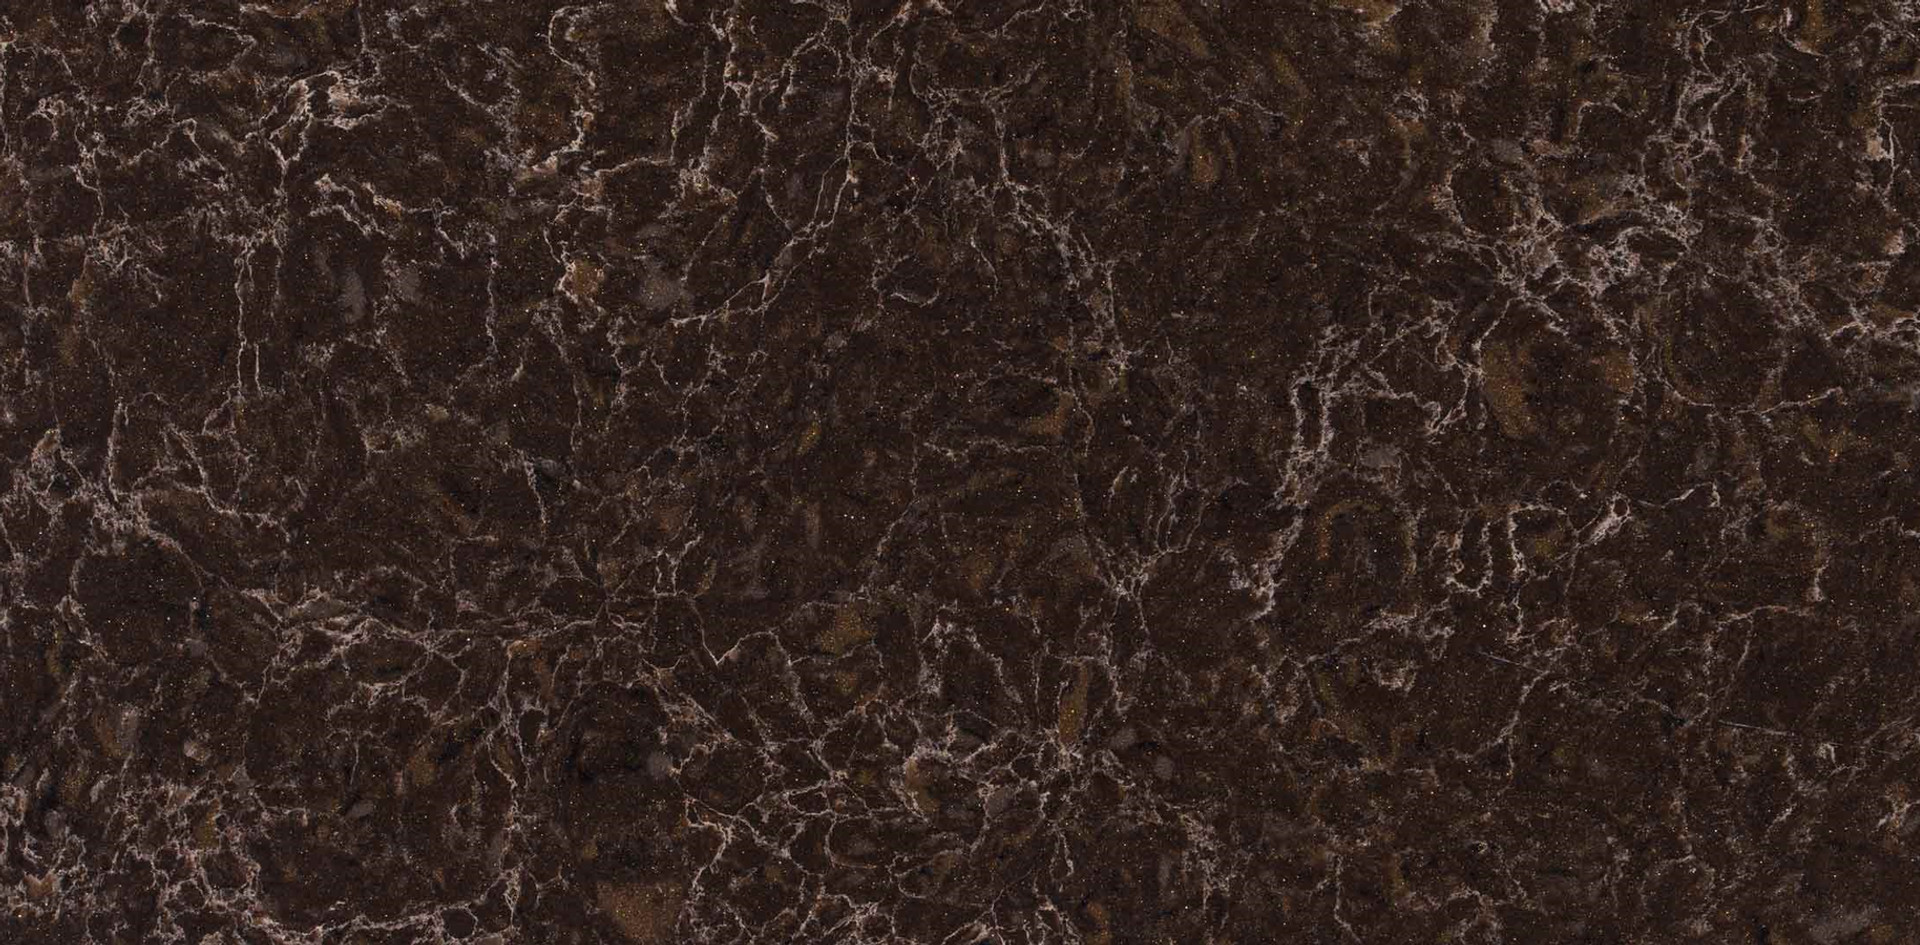 Caesarstone - Caldera 6684